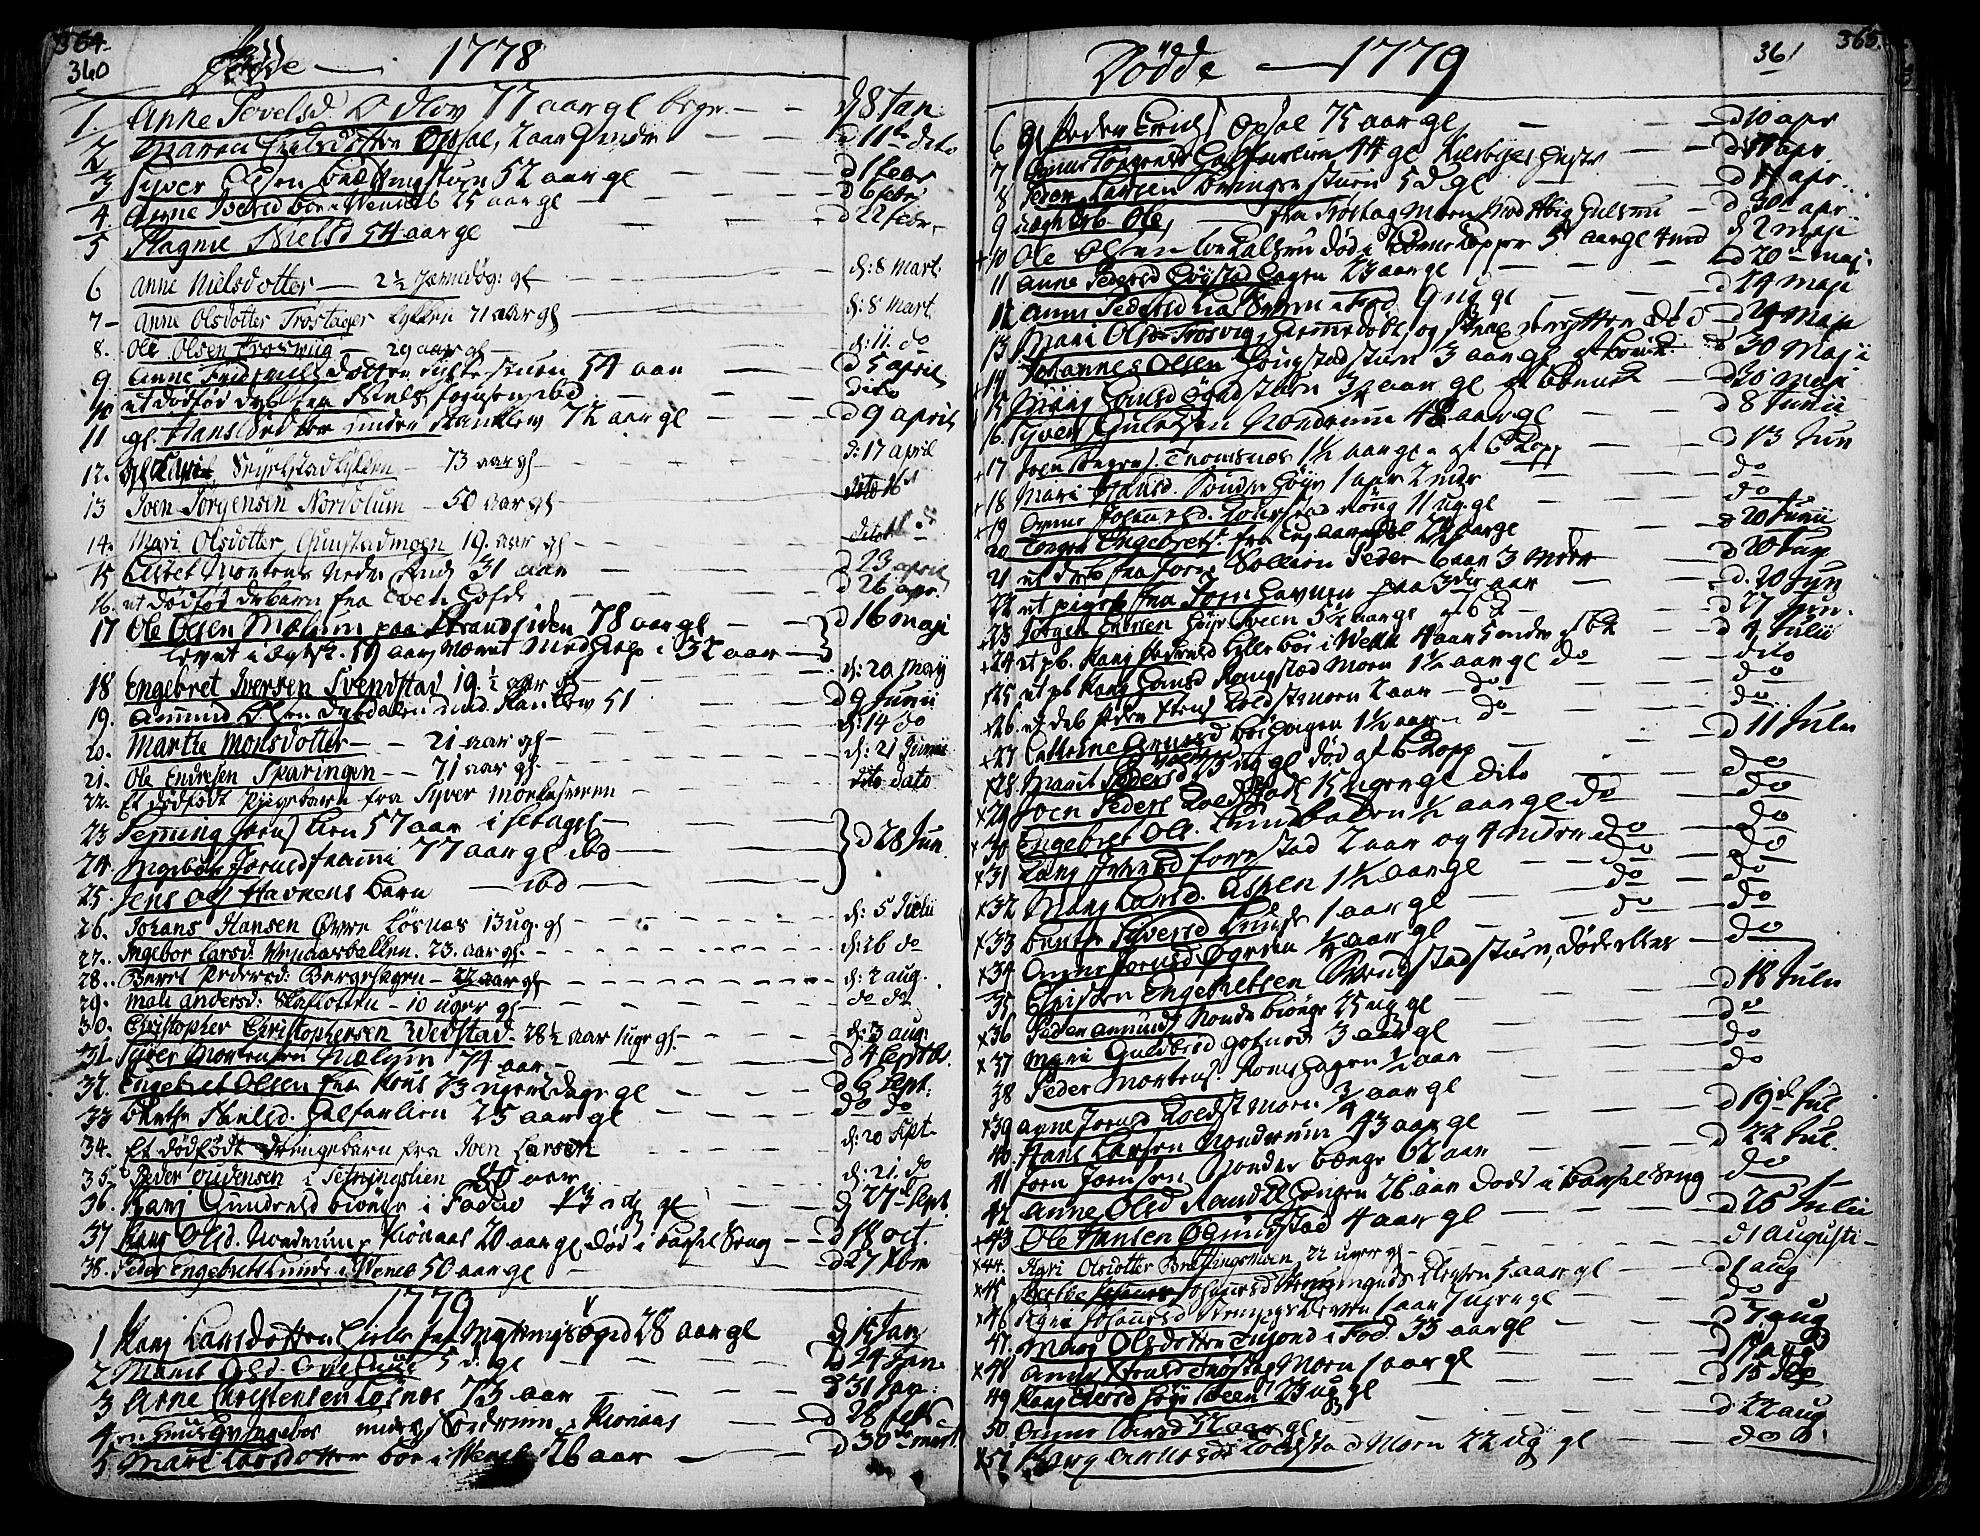 SAH, Ringebu prestekontor, Ministerialbok nr. 2, 1734-1780, s. 360-361